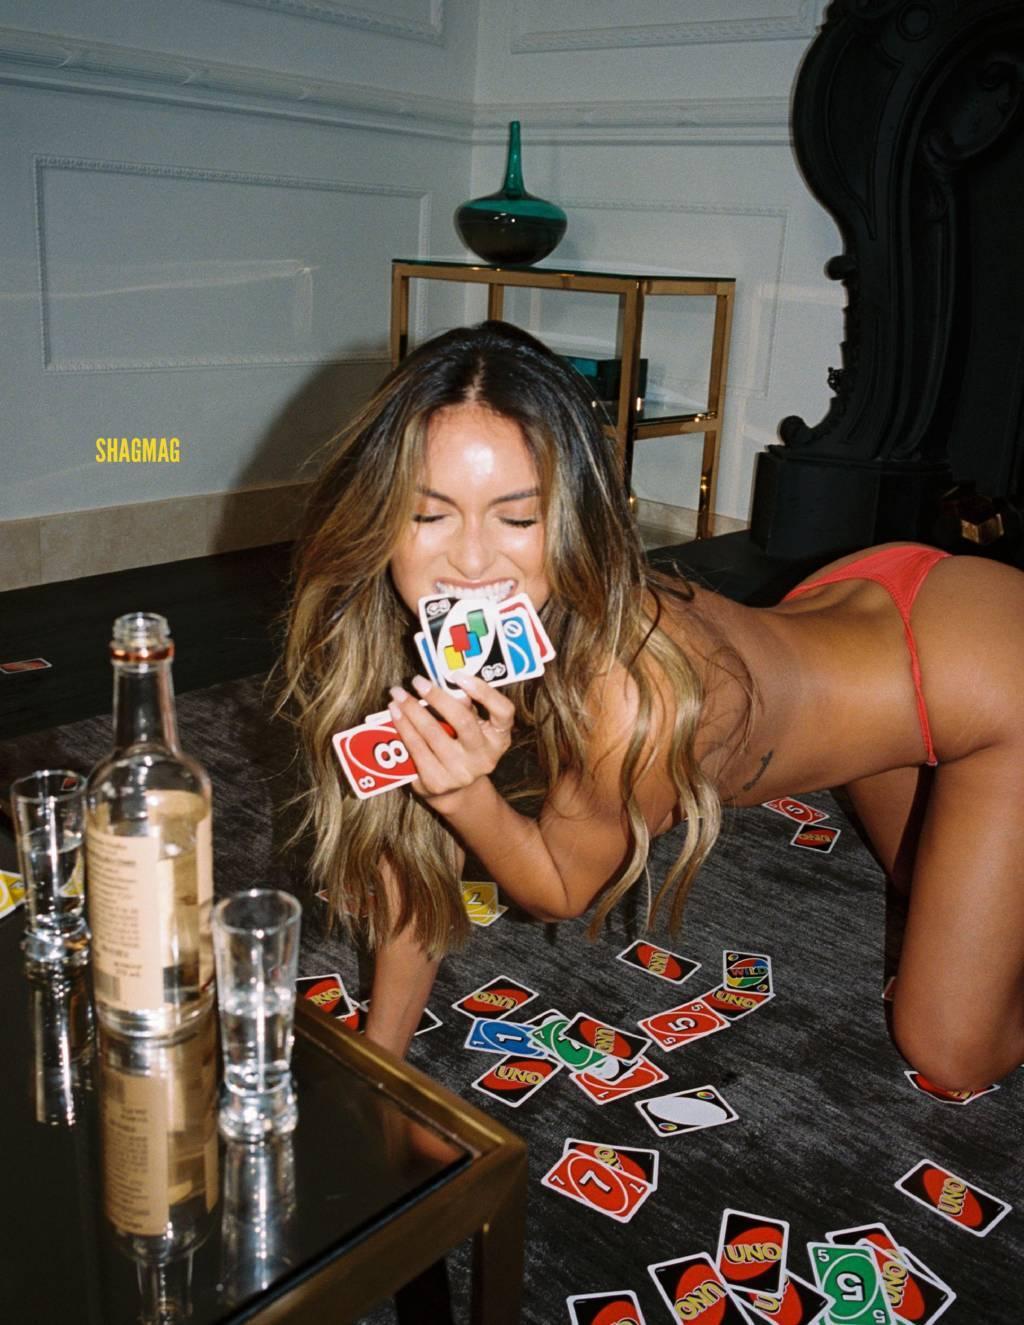 Desiree Schlotz Nude Onlyfans Leaked 0037